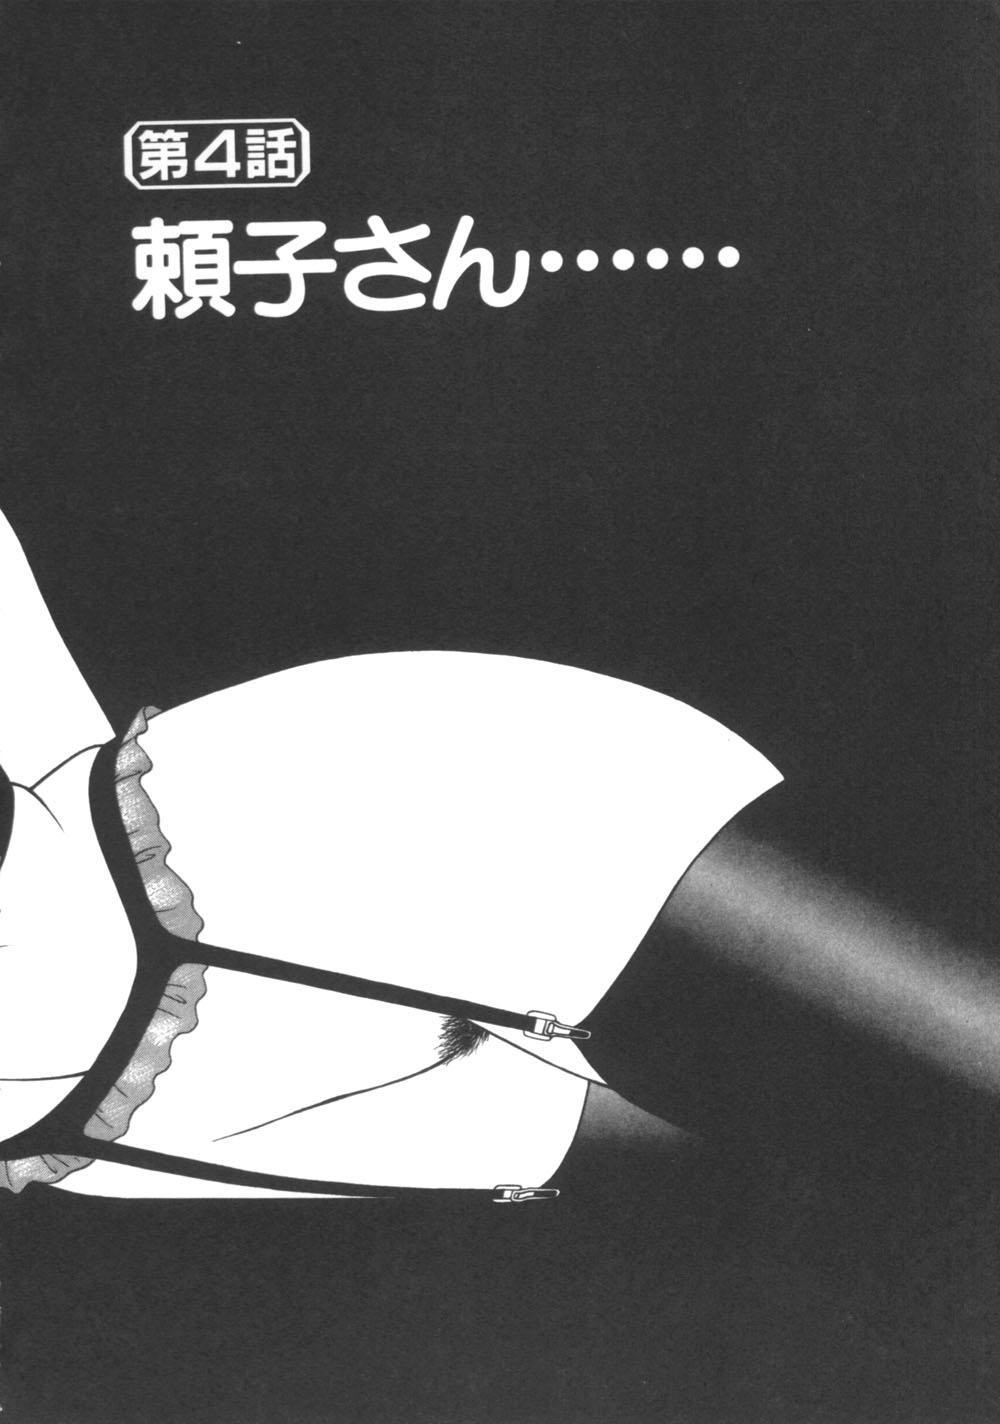 Genki ni Narisou 59